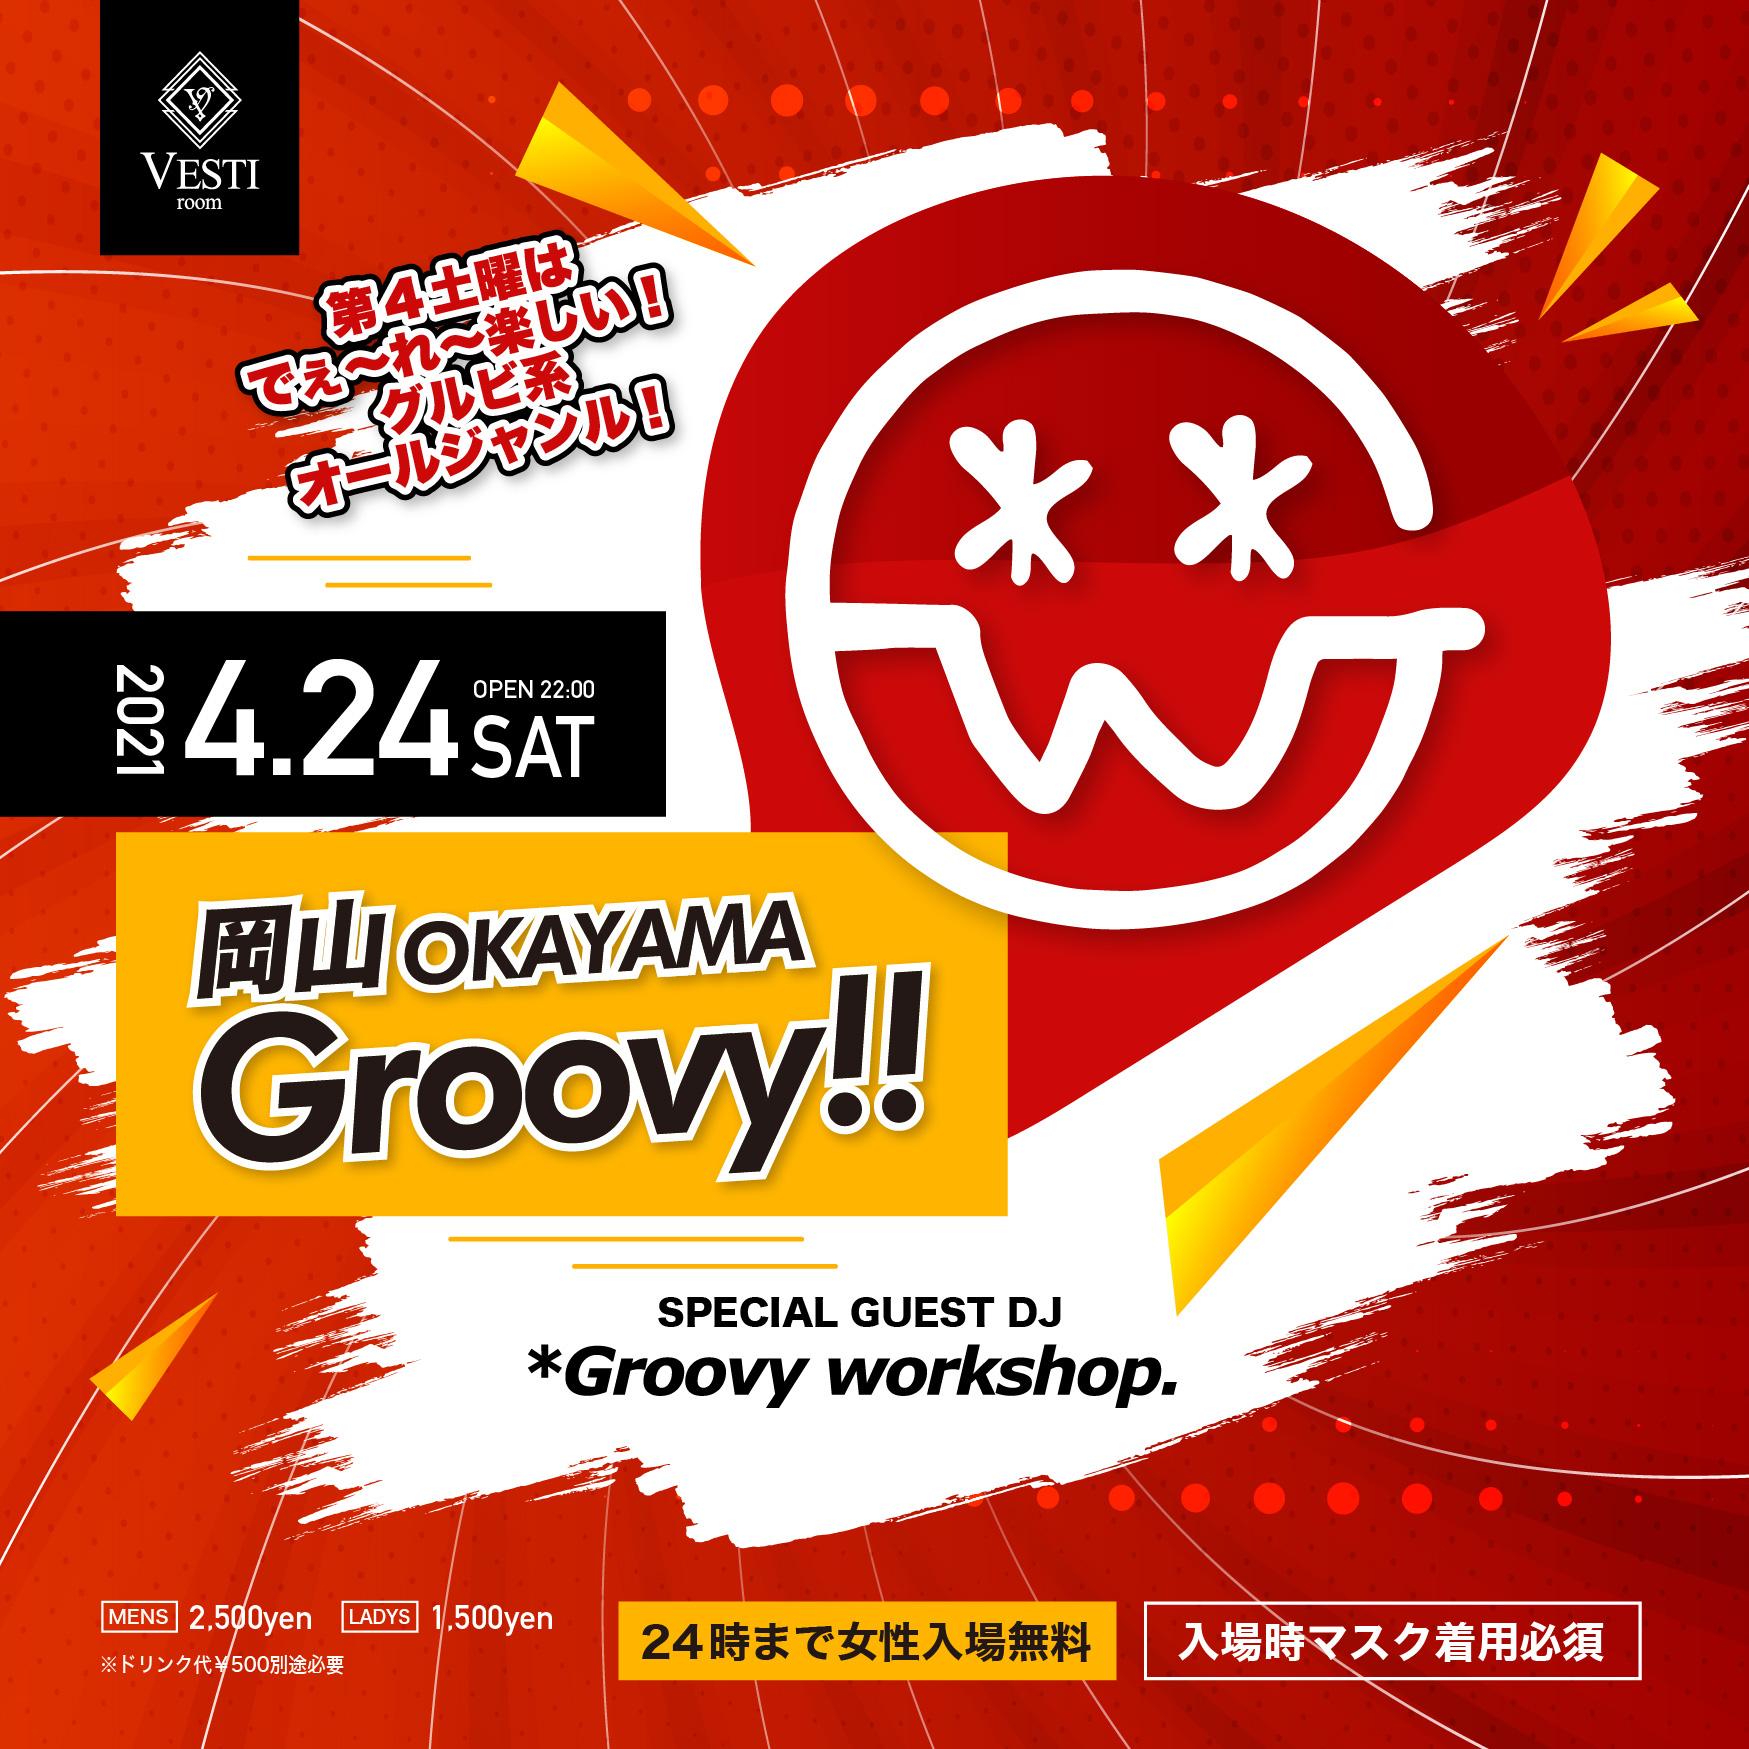 岡山Groovy!! ~Guest : DJ *Groovy workshop.~ 24時まで女性入場無料